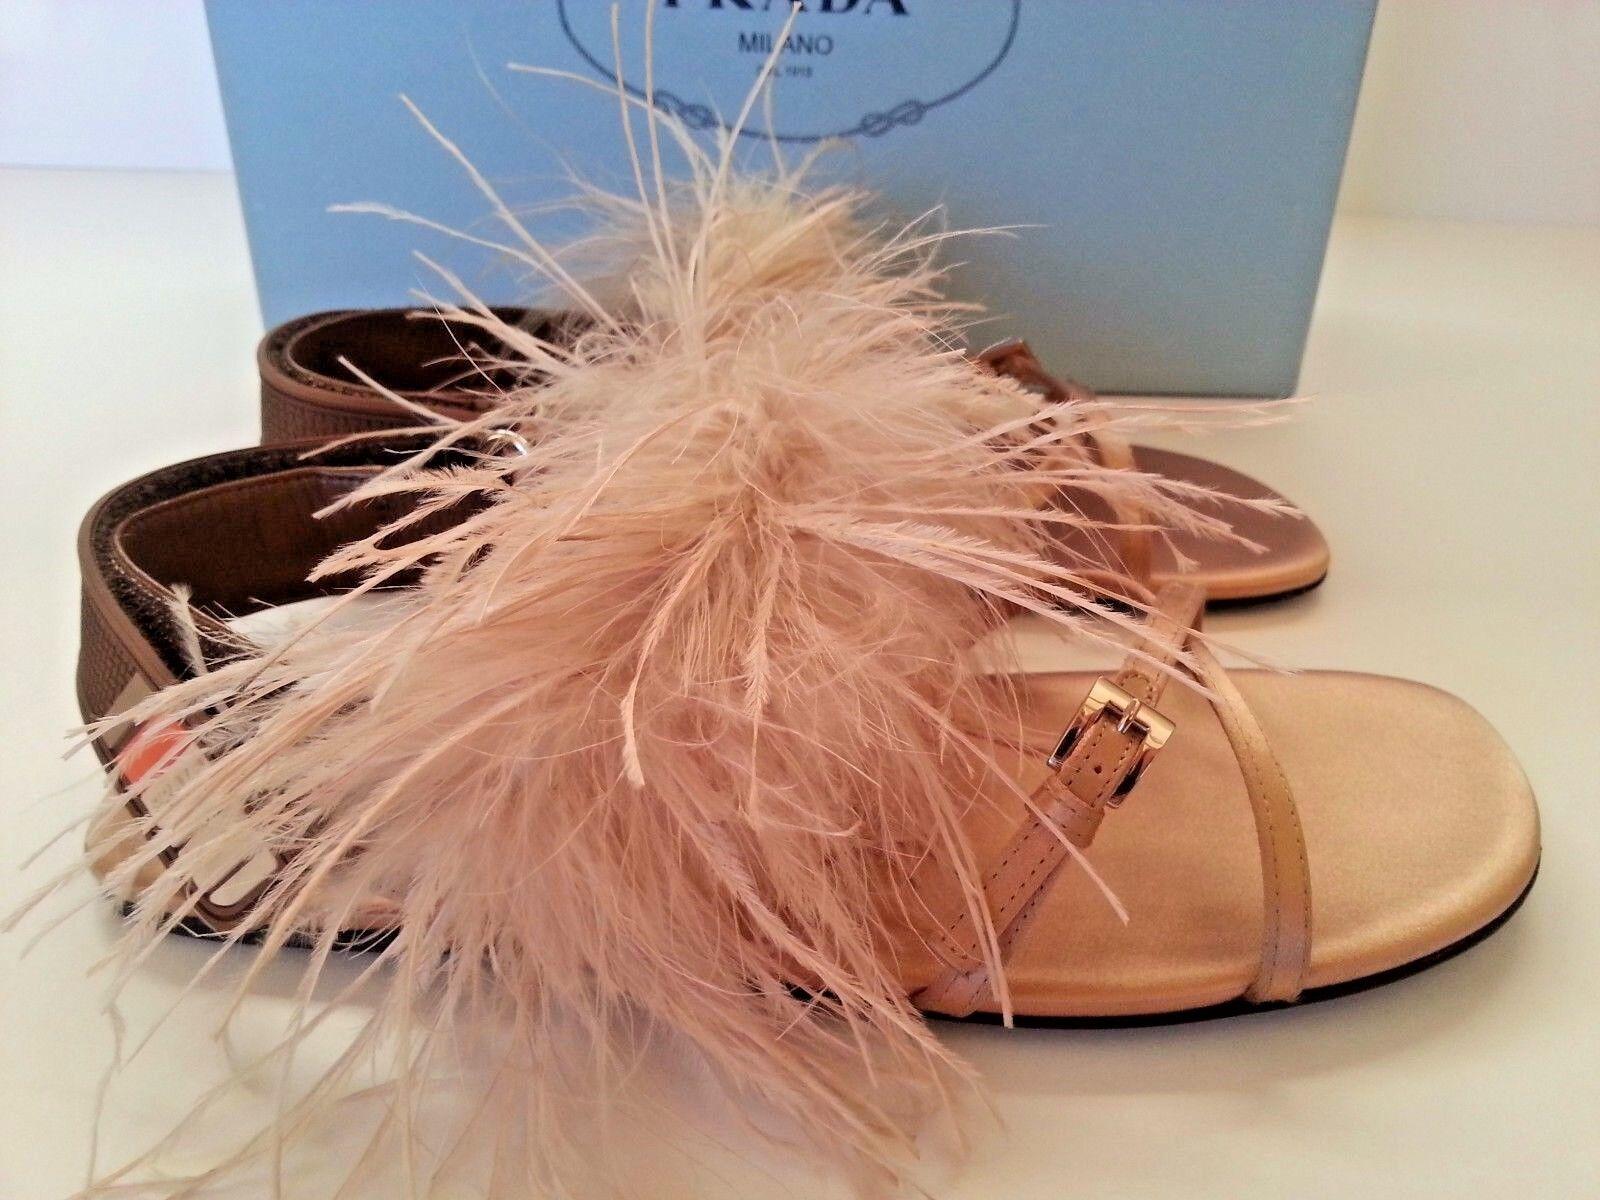 New PRADA Feather Embellished Crisscross Flat Satin Slingback Sandals 35 run BIG